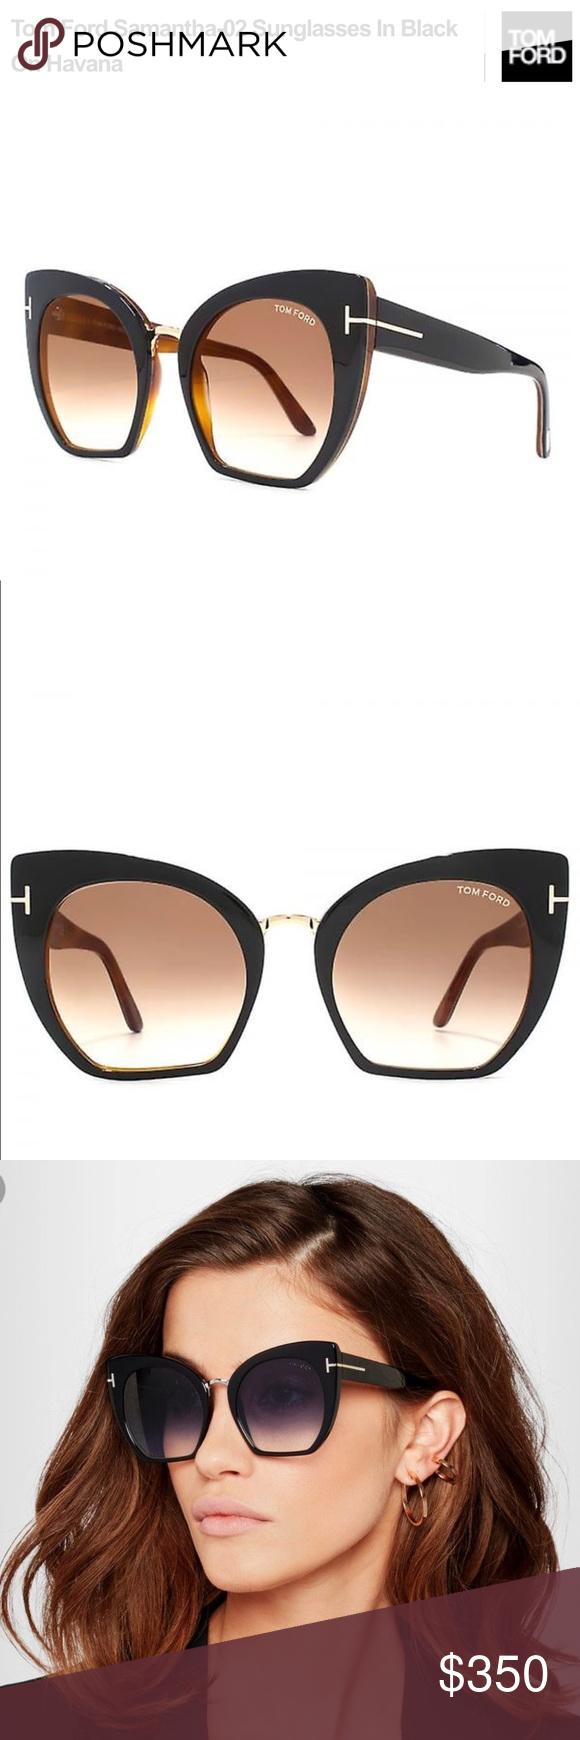 c8b4a6d92627 TOM FORD FT0553 SAMANTHA Cat Eye Sunglasses TOM FORD Authentic Glamorous  Samantha Sunglasses  445+tax